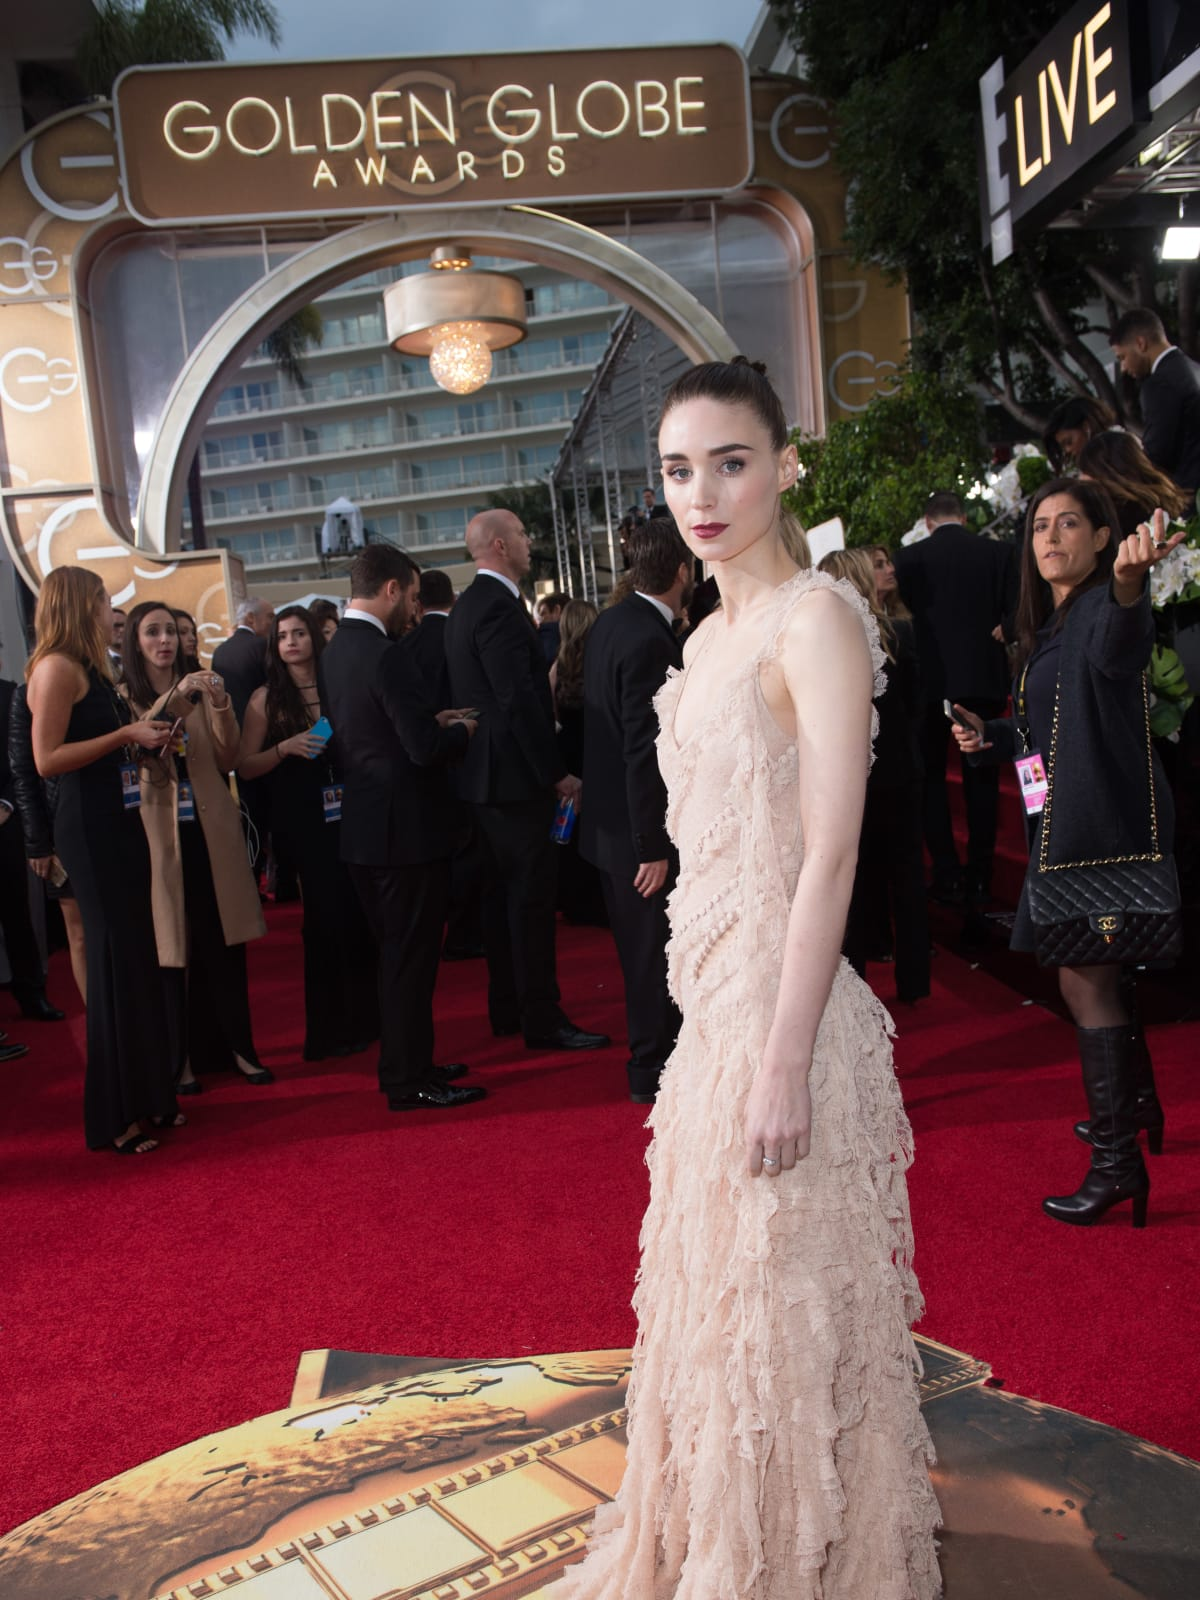 Rooney Mara at Golden Globe Awards